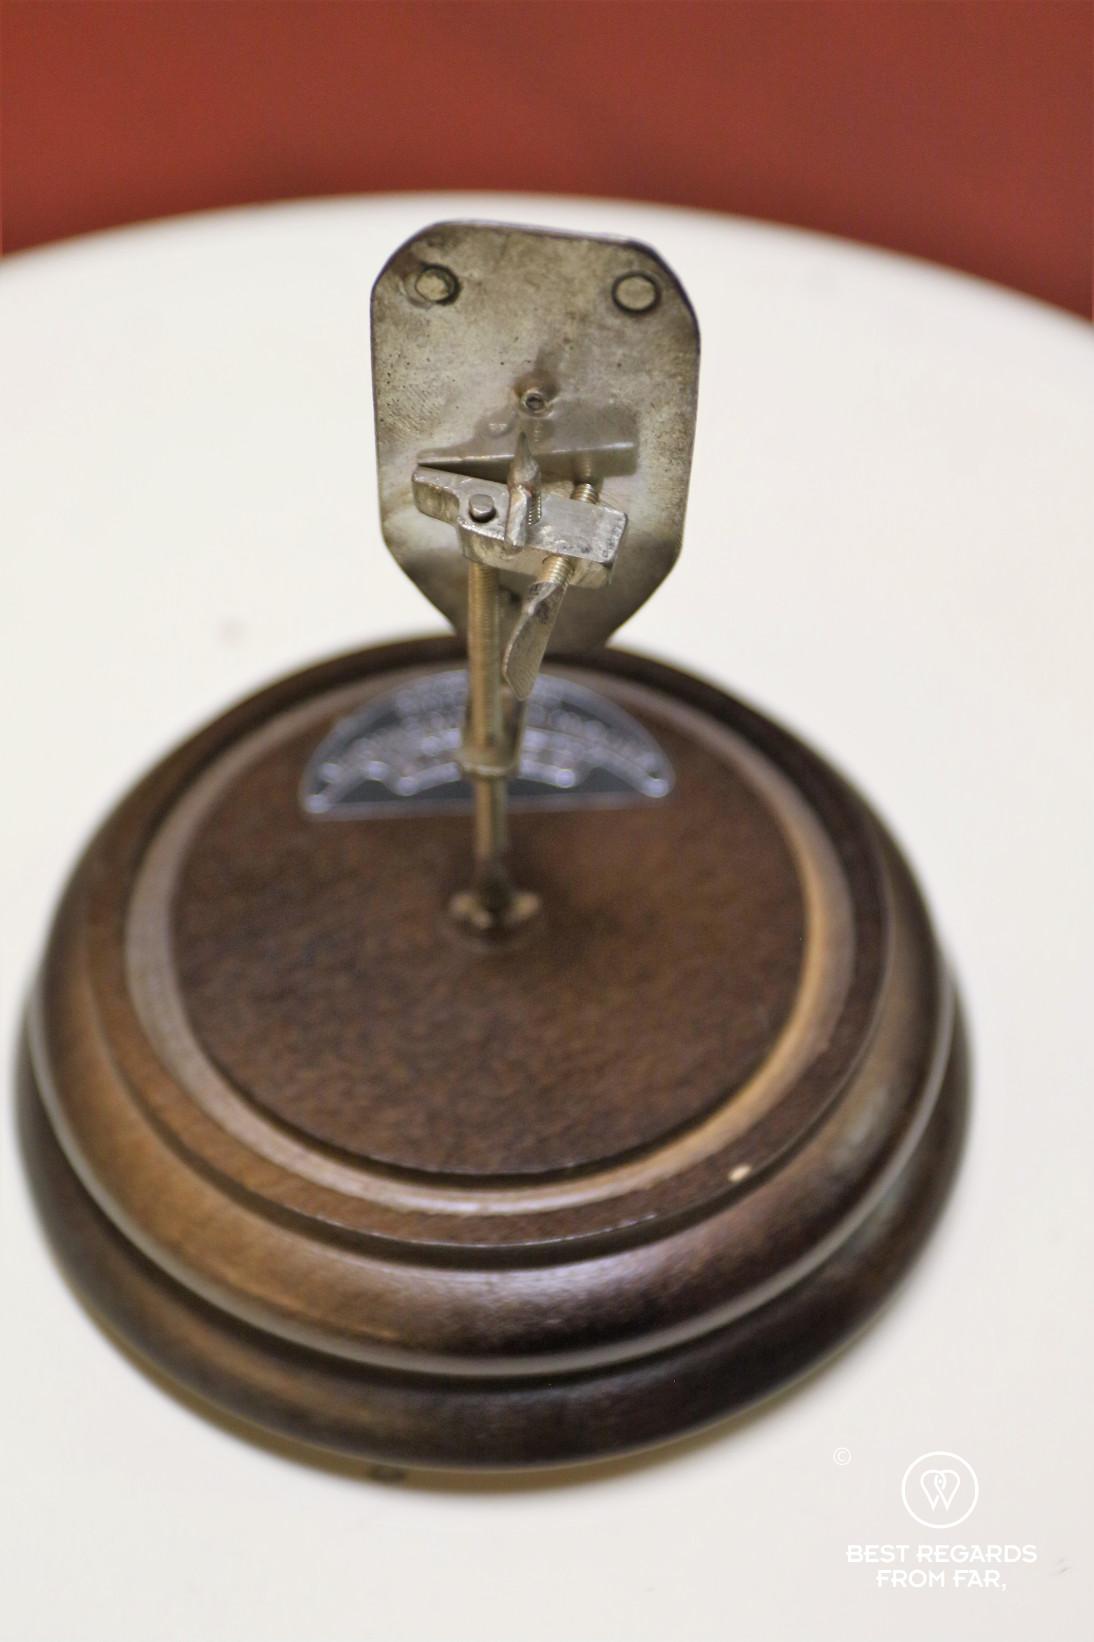 Microspope at Medisch farmaceutisch museum de griffioen, Delft, The Netherlands